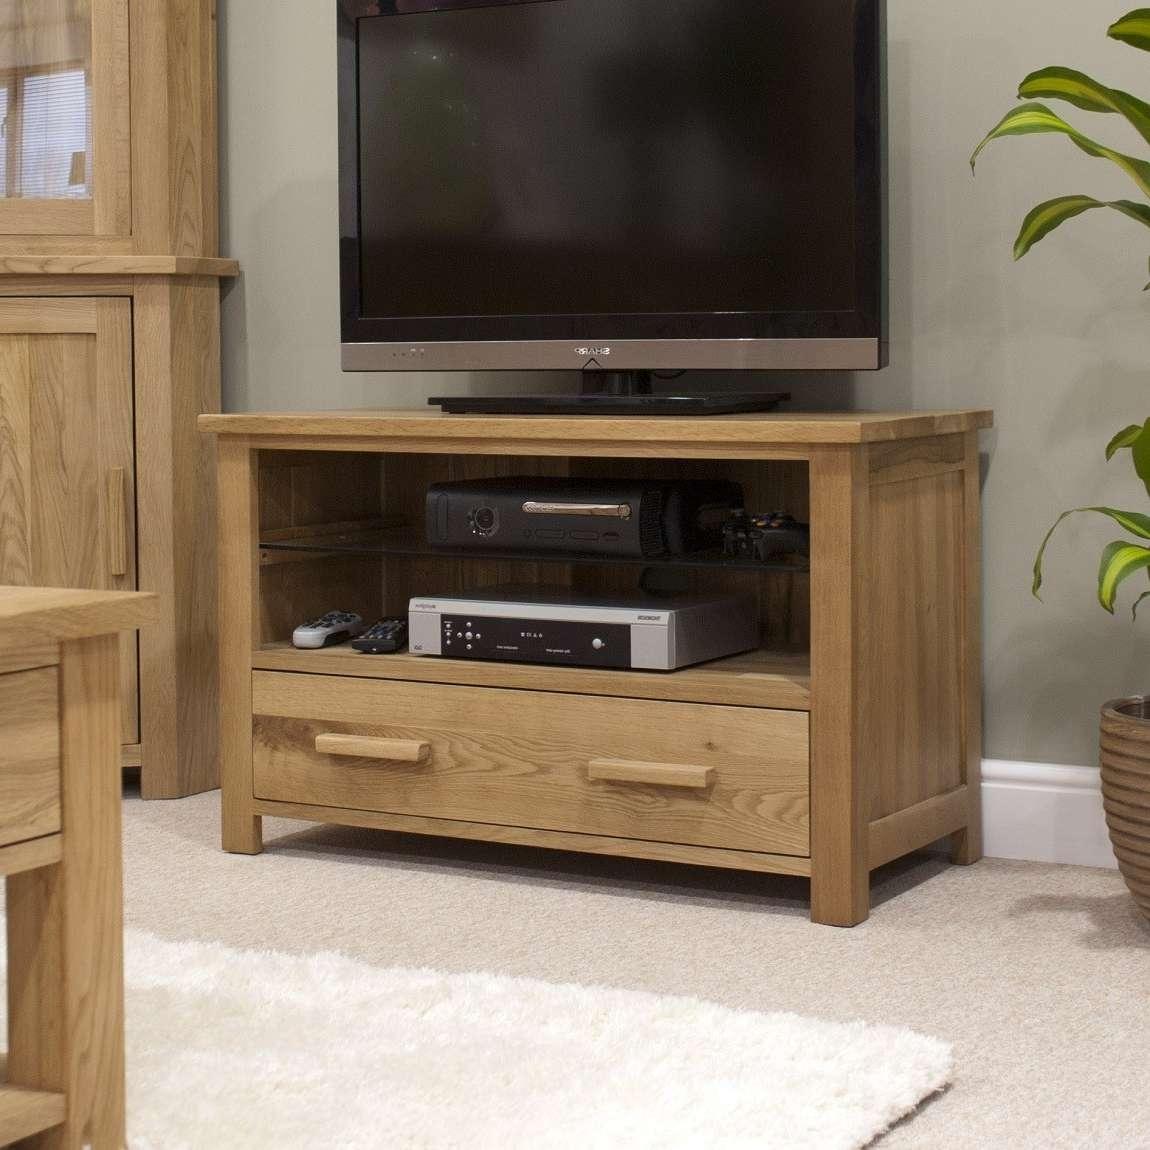 Opus Solid Oak Tv Cabinet | Oak Furniture Uk Pertaining To Oak Tv Cabinets (View 4 of 20)